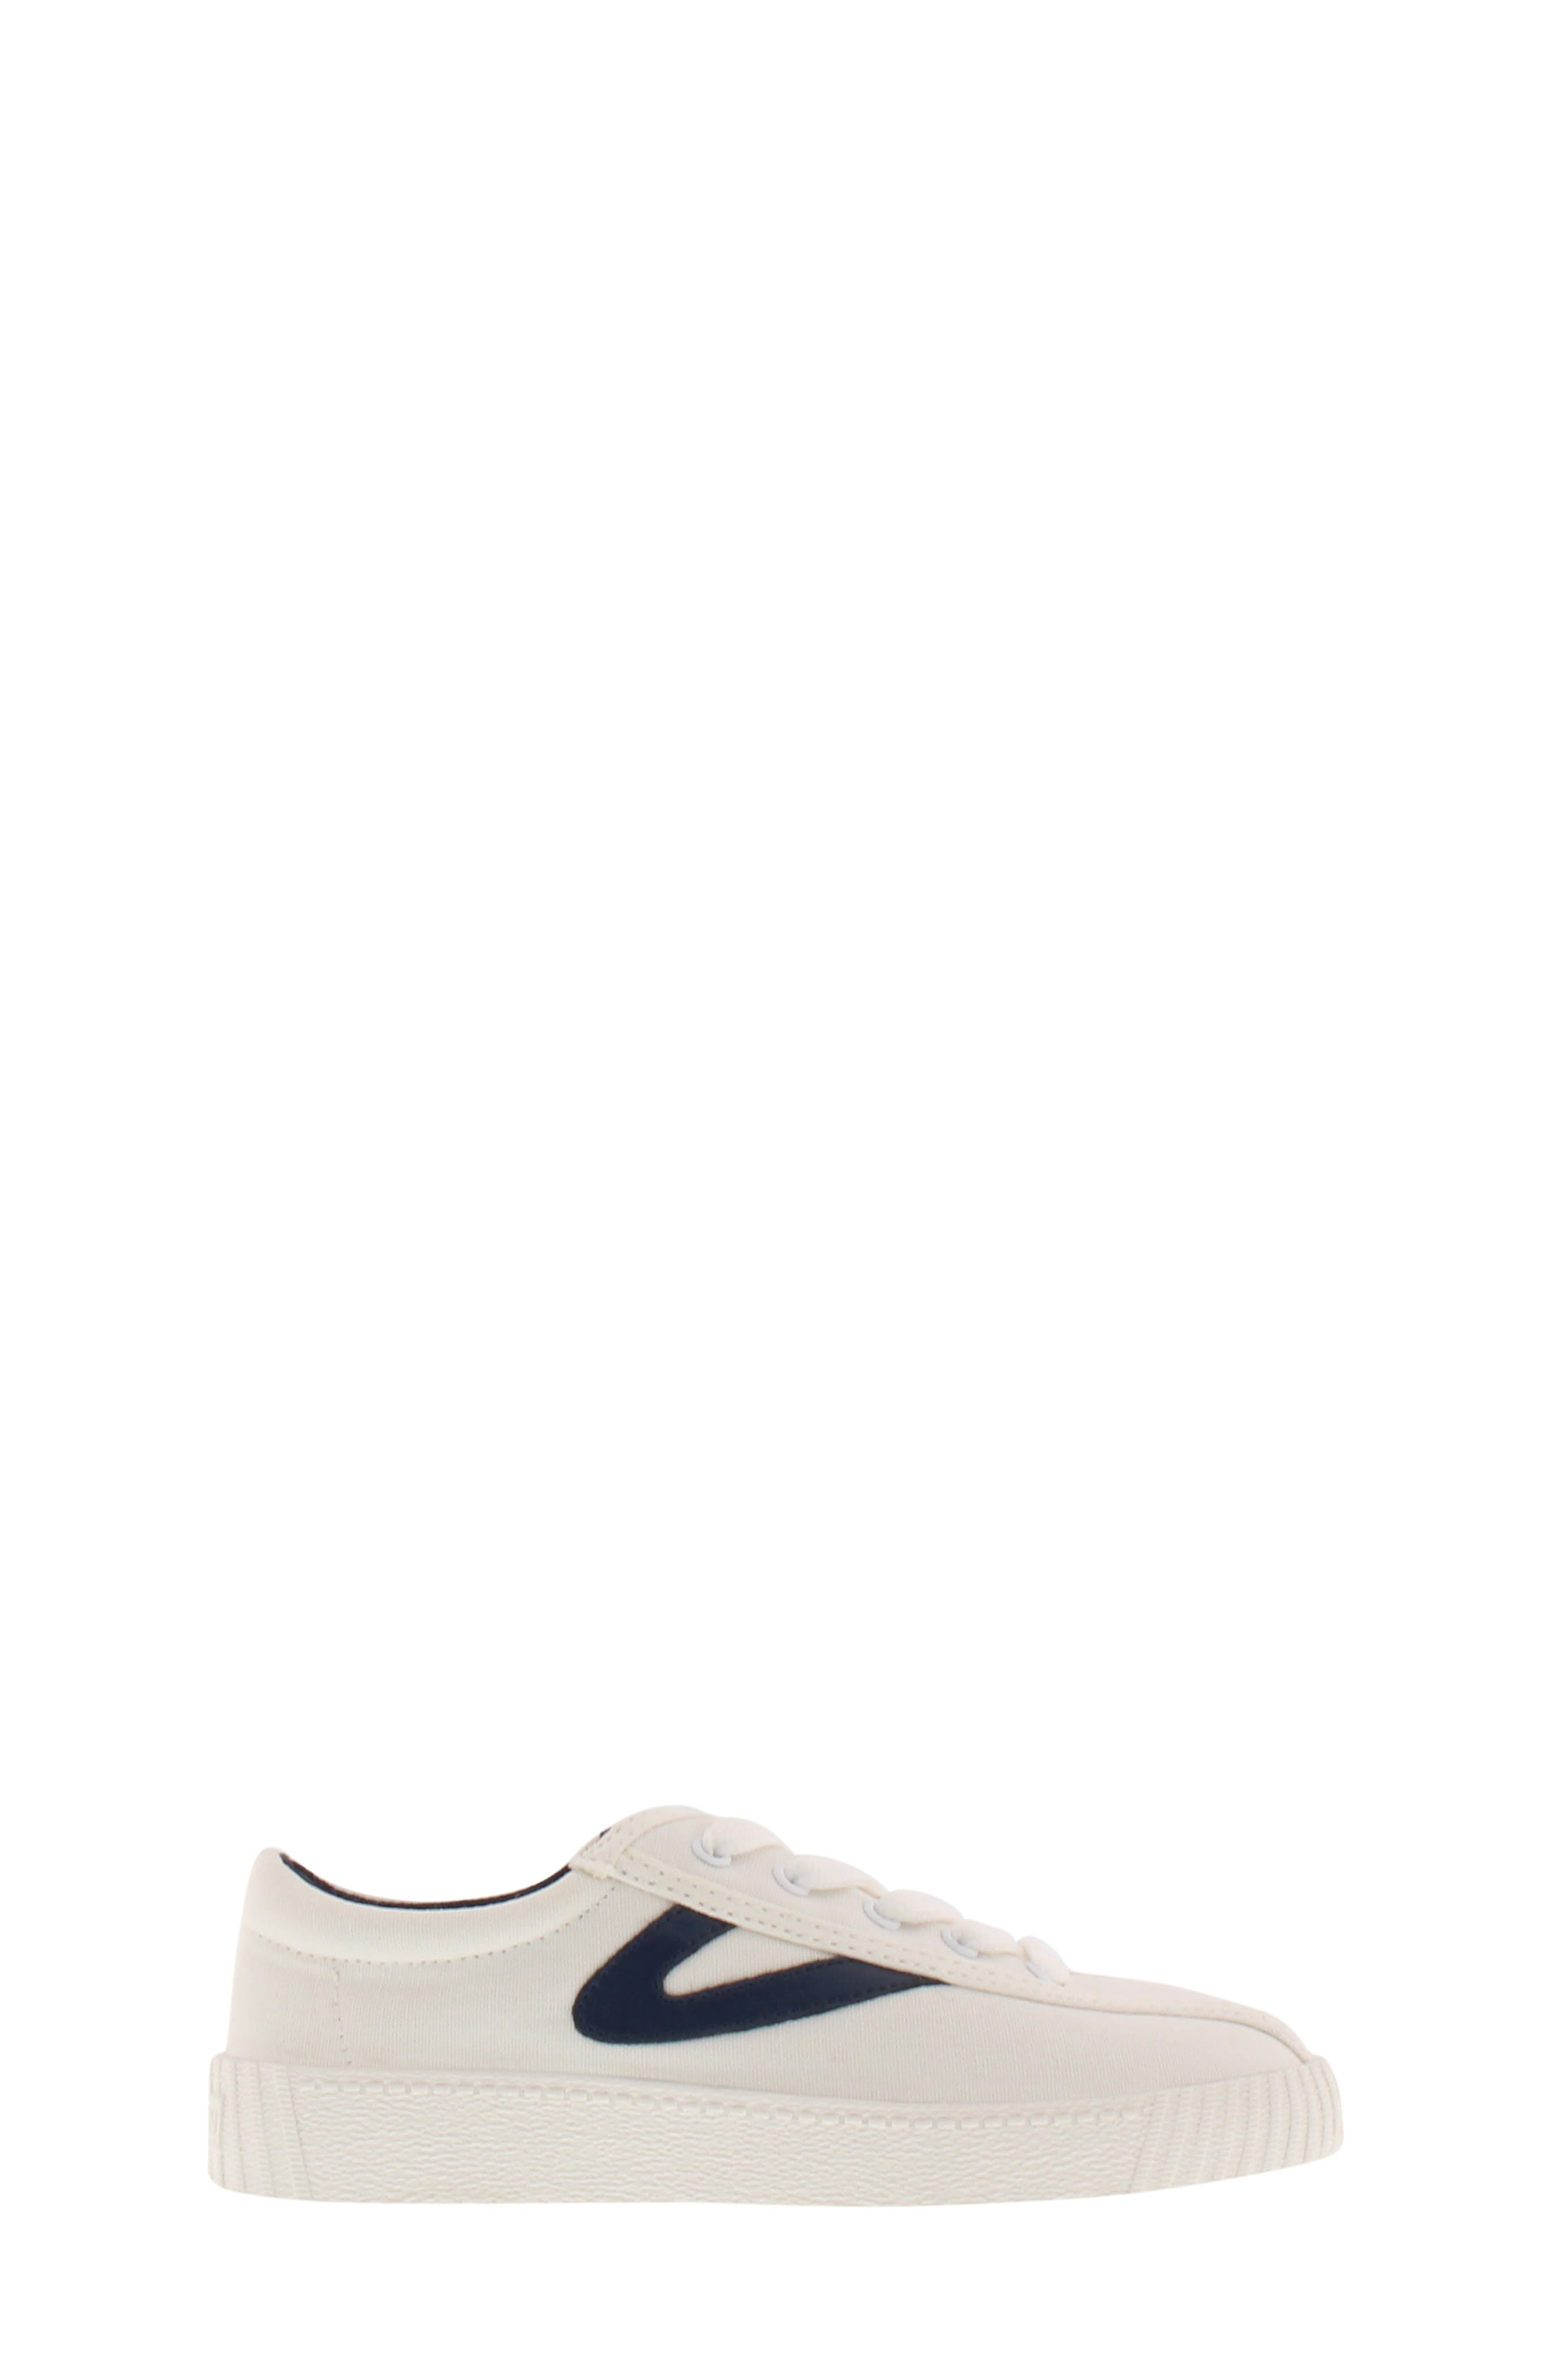 Nylite Plus Sneaker,                             Alternate thumbnail 3, color,                             WHITE/ NIGHT